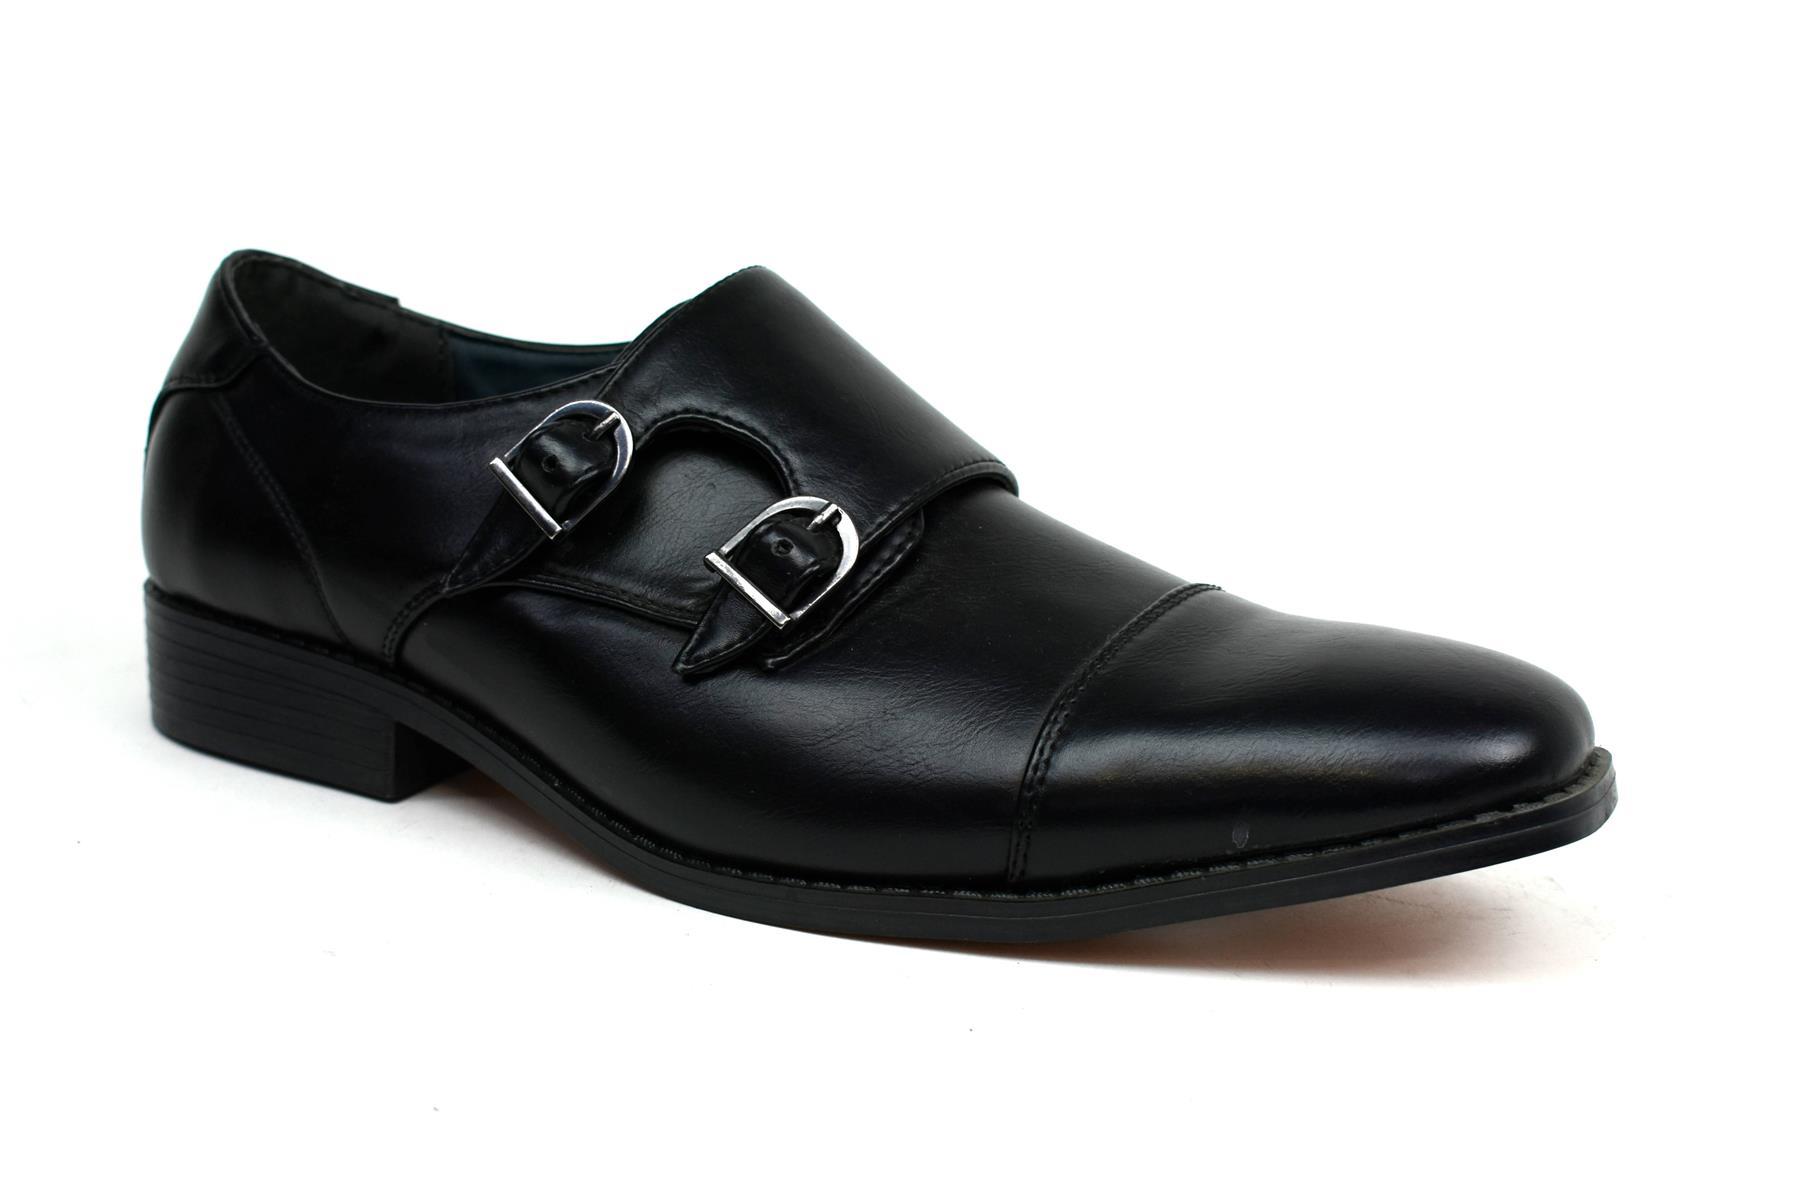 New Black Smart Leather Monk Double Buckle Low Heel Formal Men Shoe UK Size